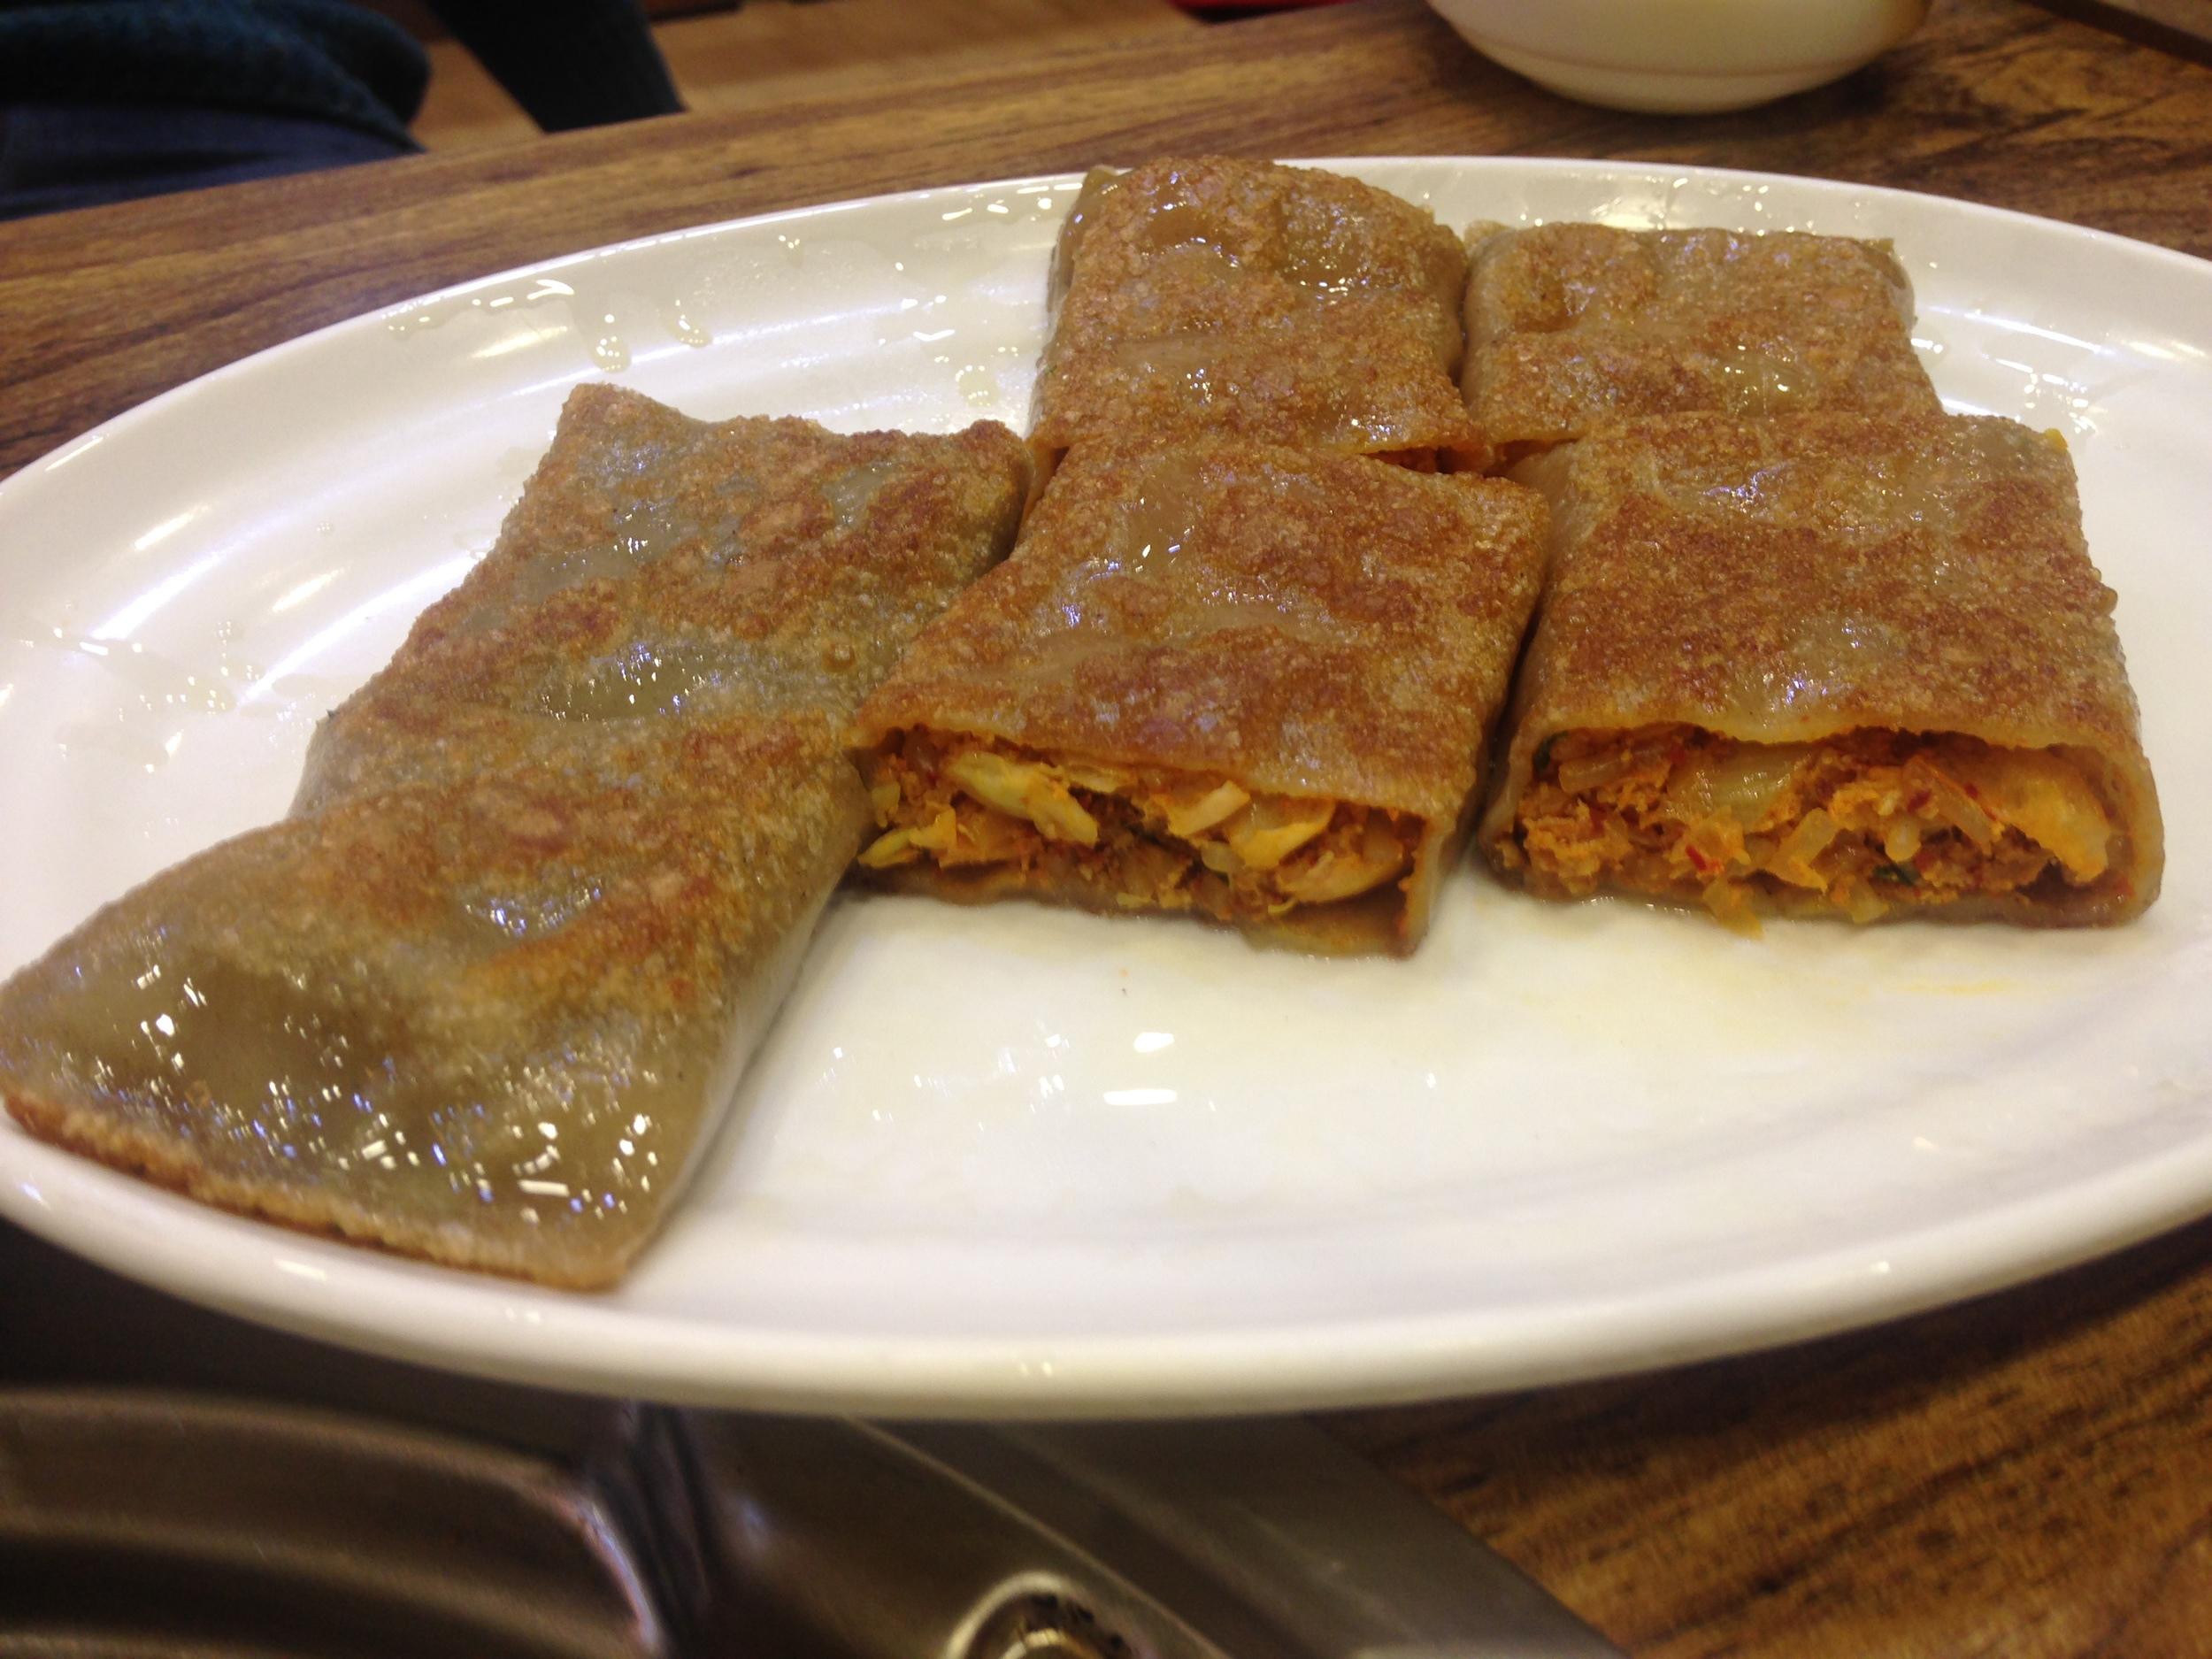 pohanková omeleta